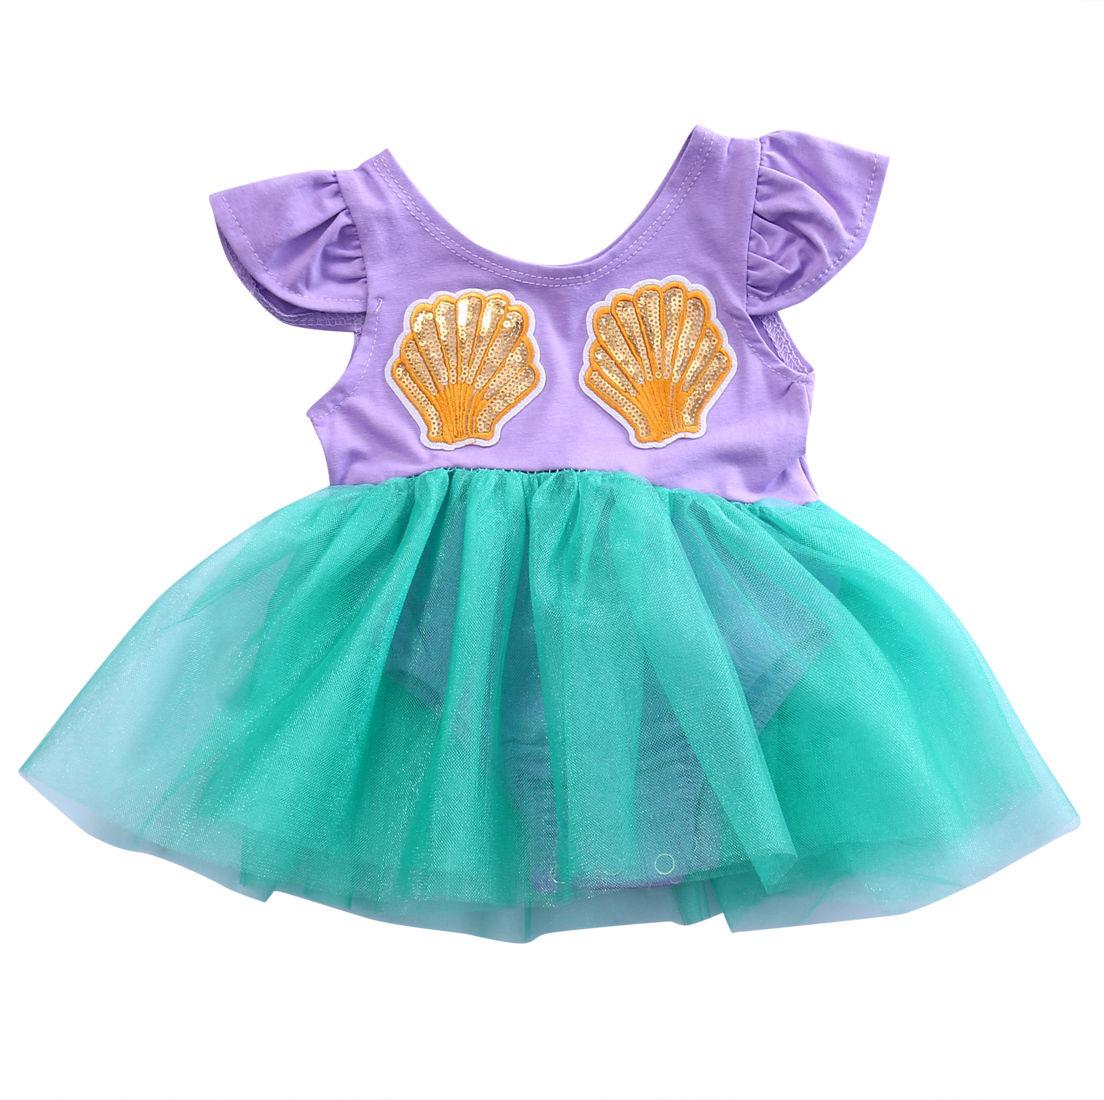 78b090f0d US $4.24 6% OFF|Cute Newborn Baby Girls Mermaid Romper Dresses Mesh Ball  Gown Little Tulle Girl Dress -in Dresses from Mother & Kids on  Aliexpress.com ...